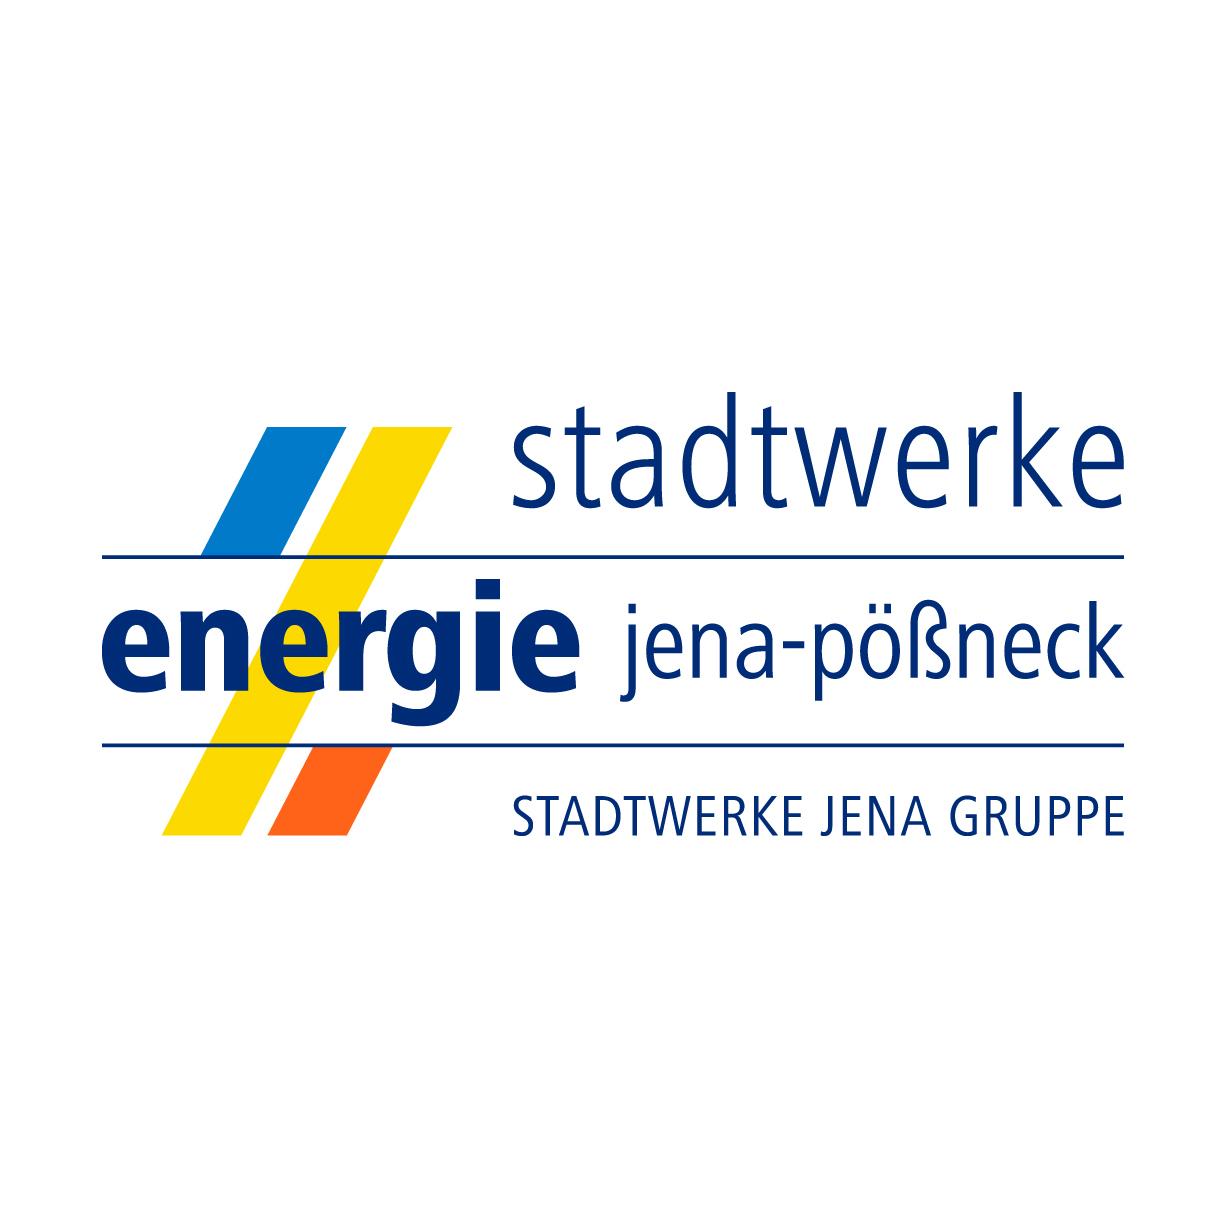 Partnerlogo Stadtwerke Energie Jena-Pößneck GmbH